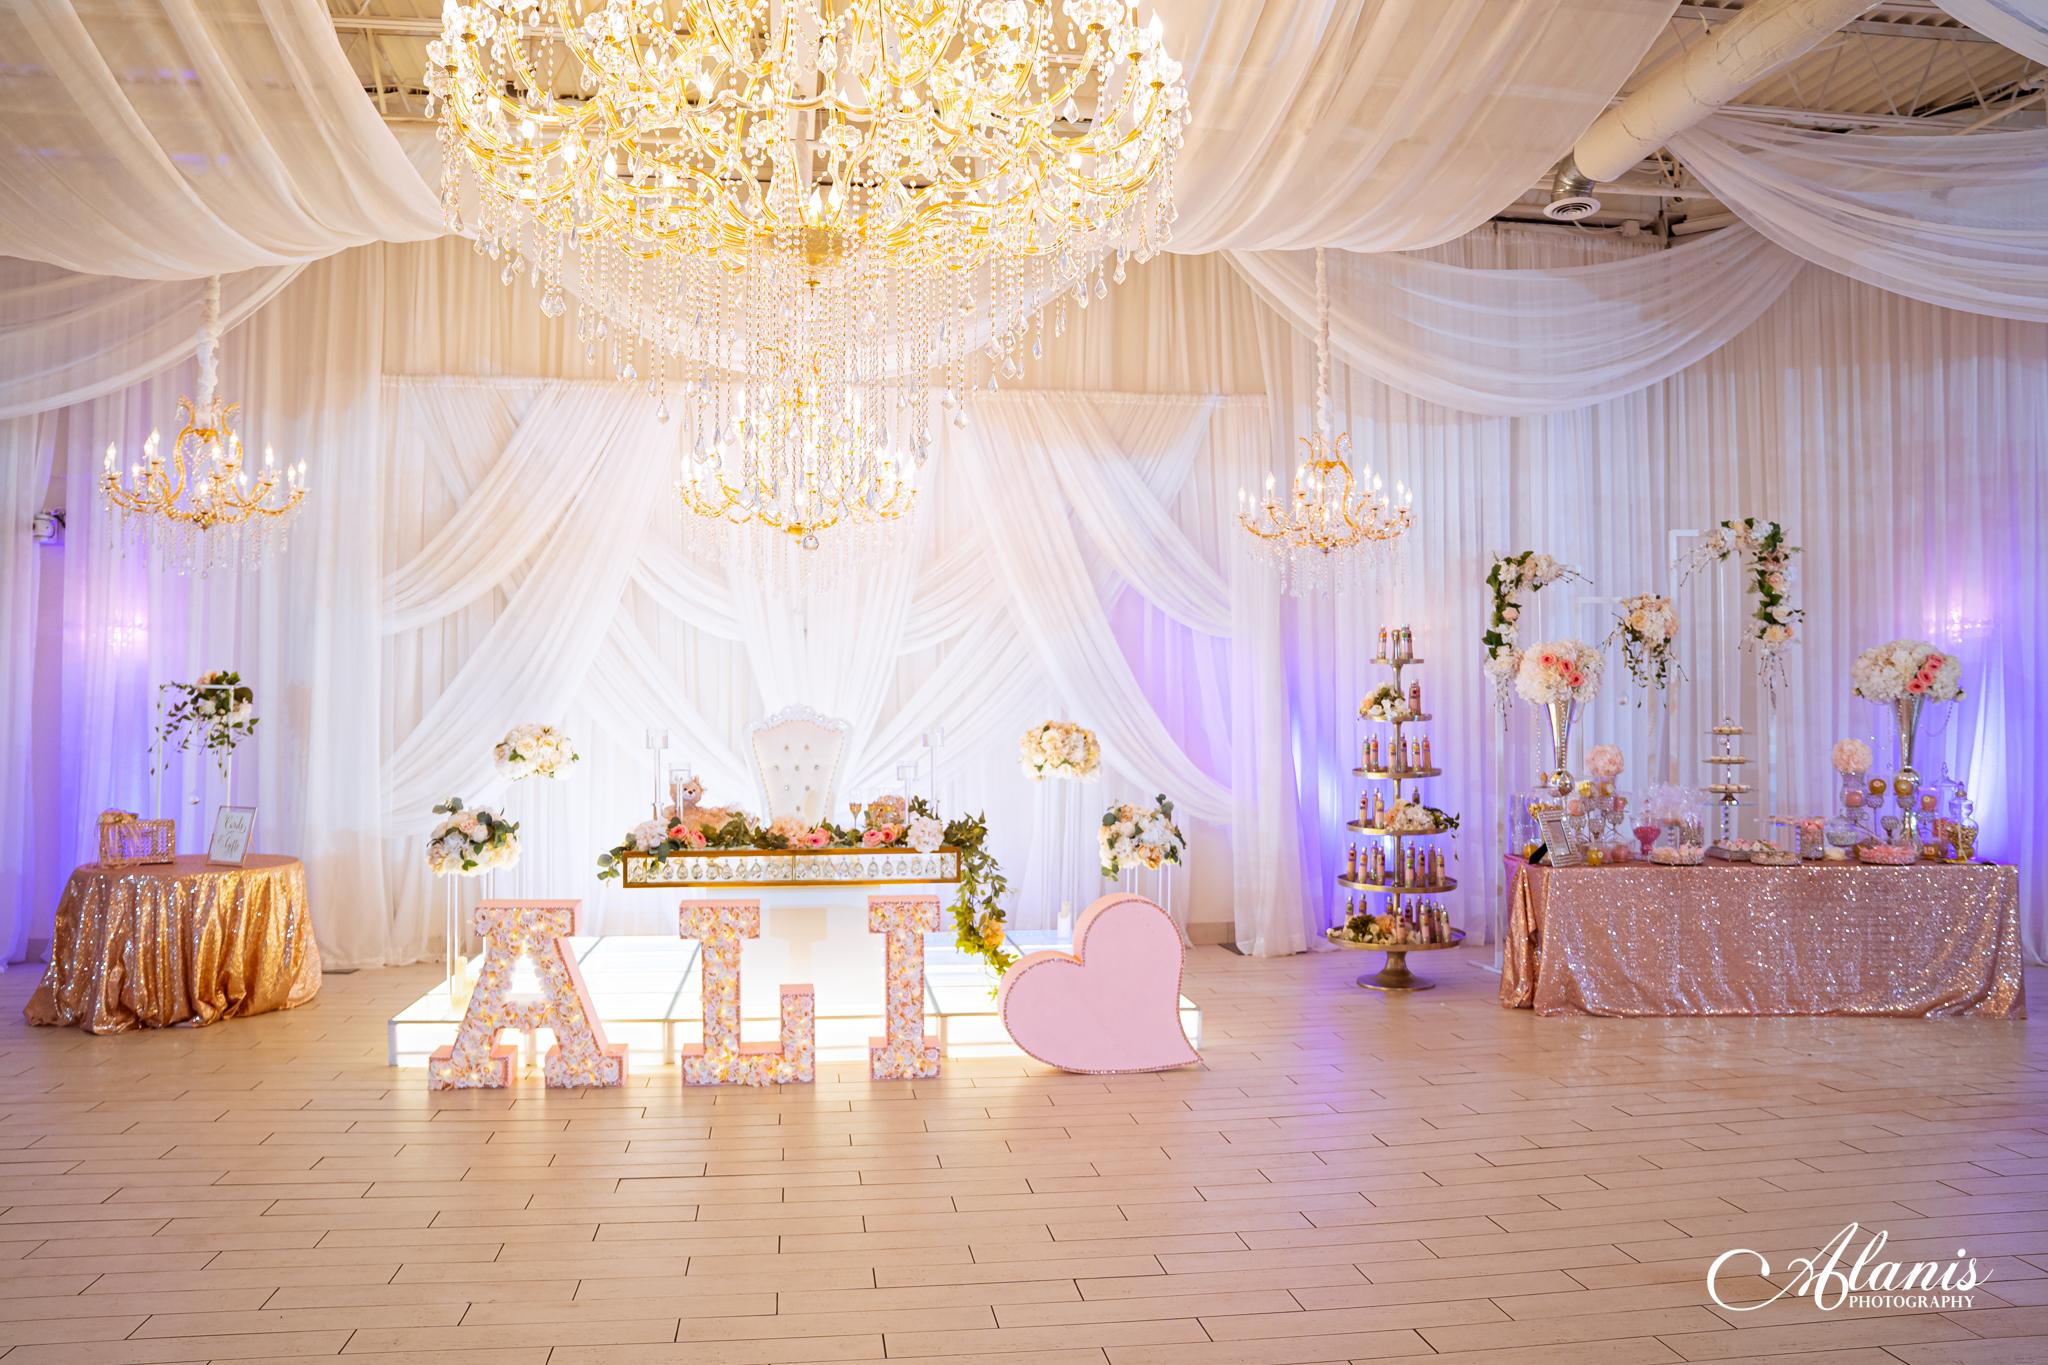 LeVenue Quinceañera front ballroom name and treat stand decor